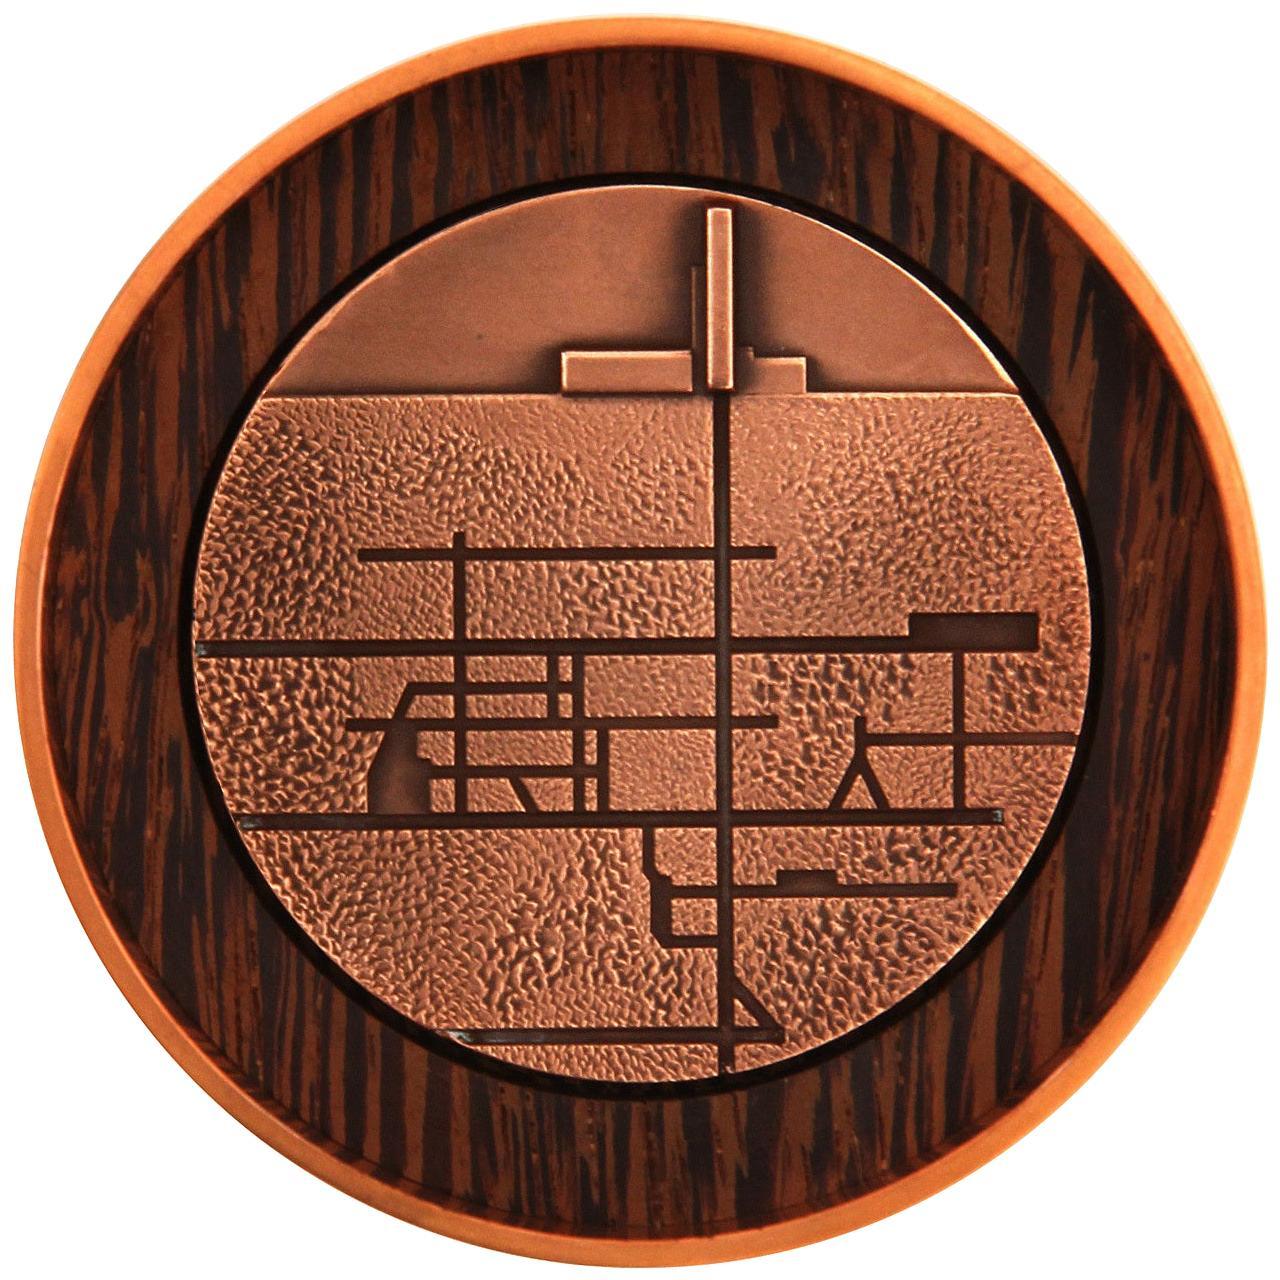 Modernist Medallion by Tapio Wirkkala